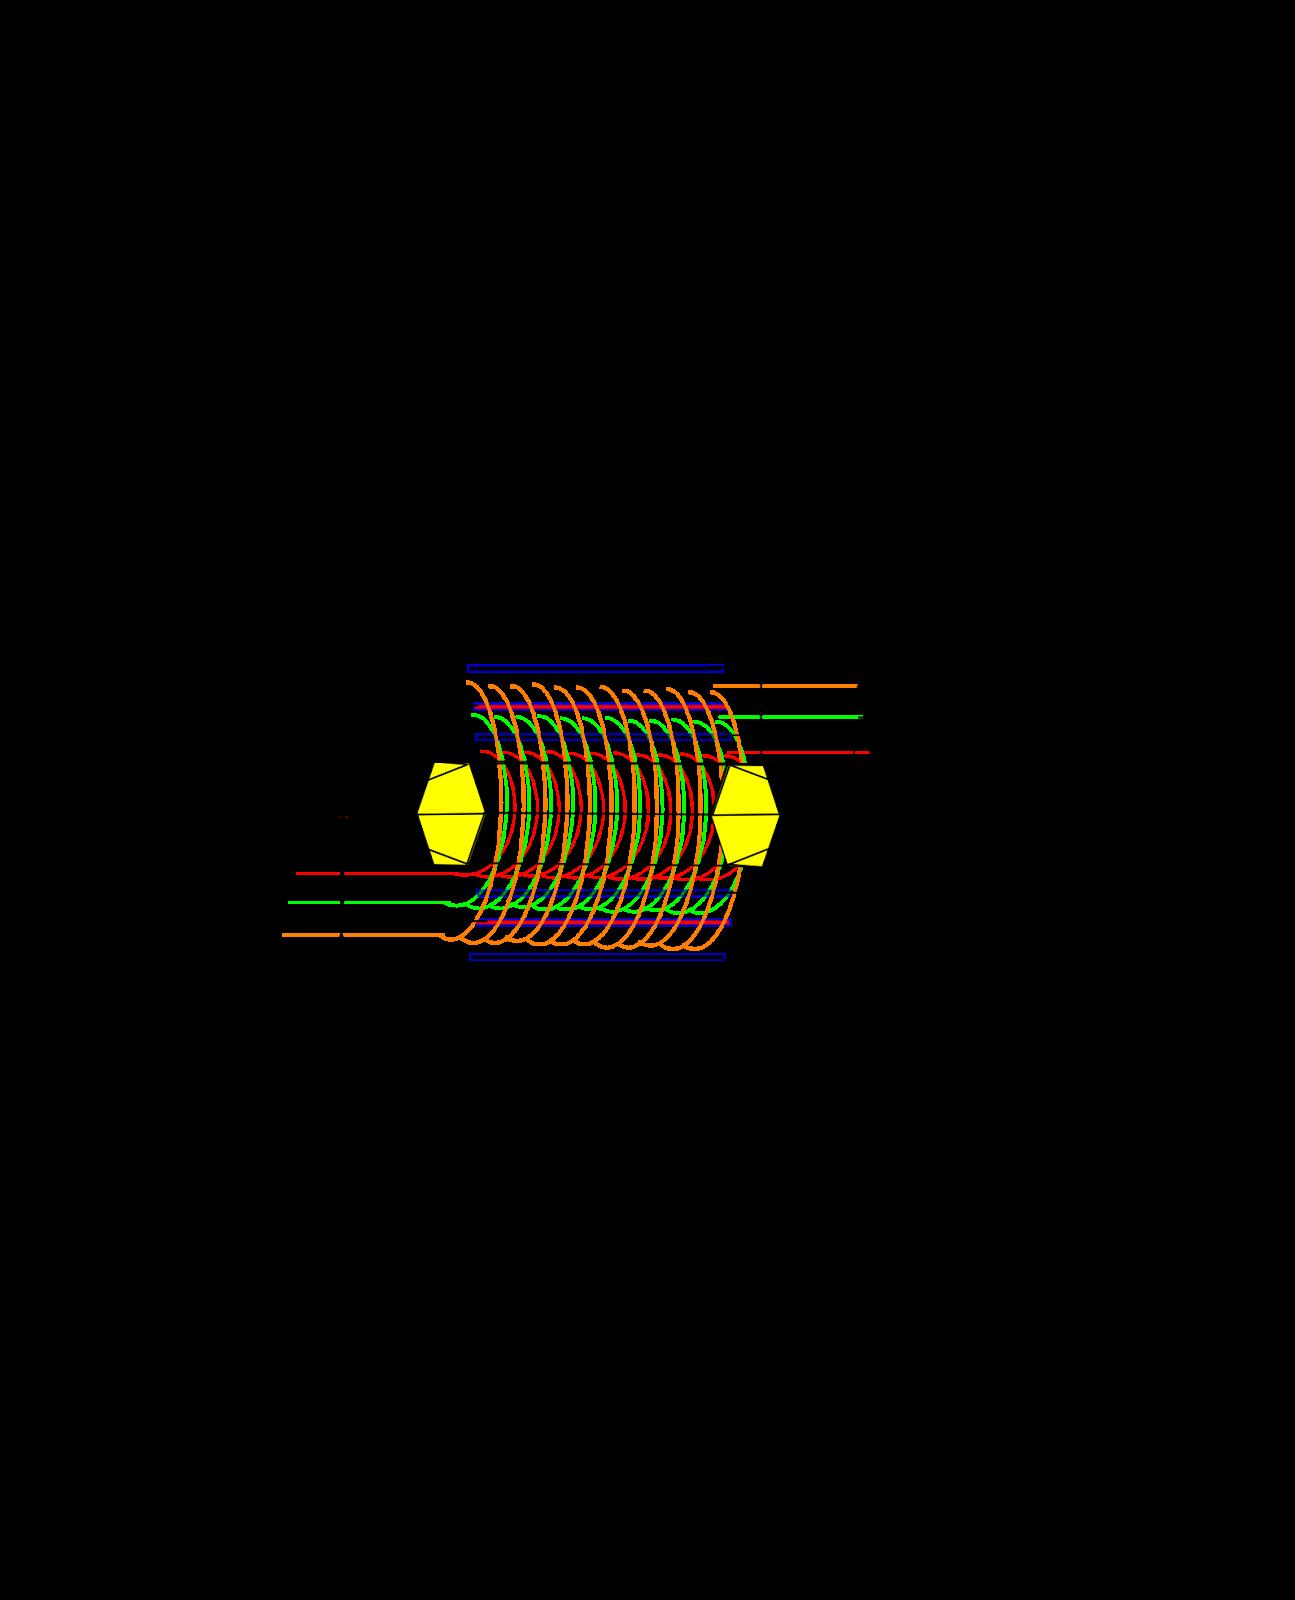 Schema Quarz elektrischer Generator als Bilder | quarzgenerator